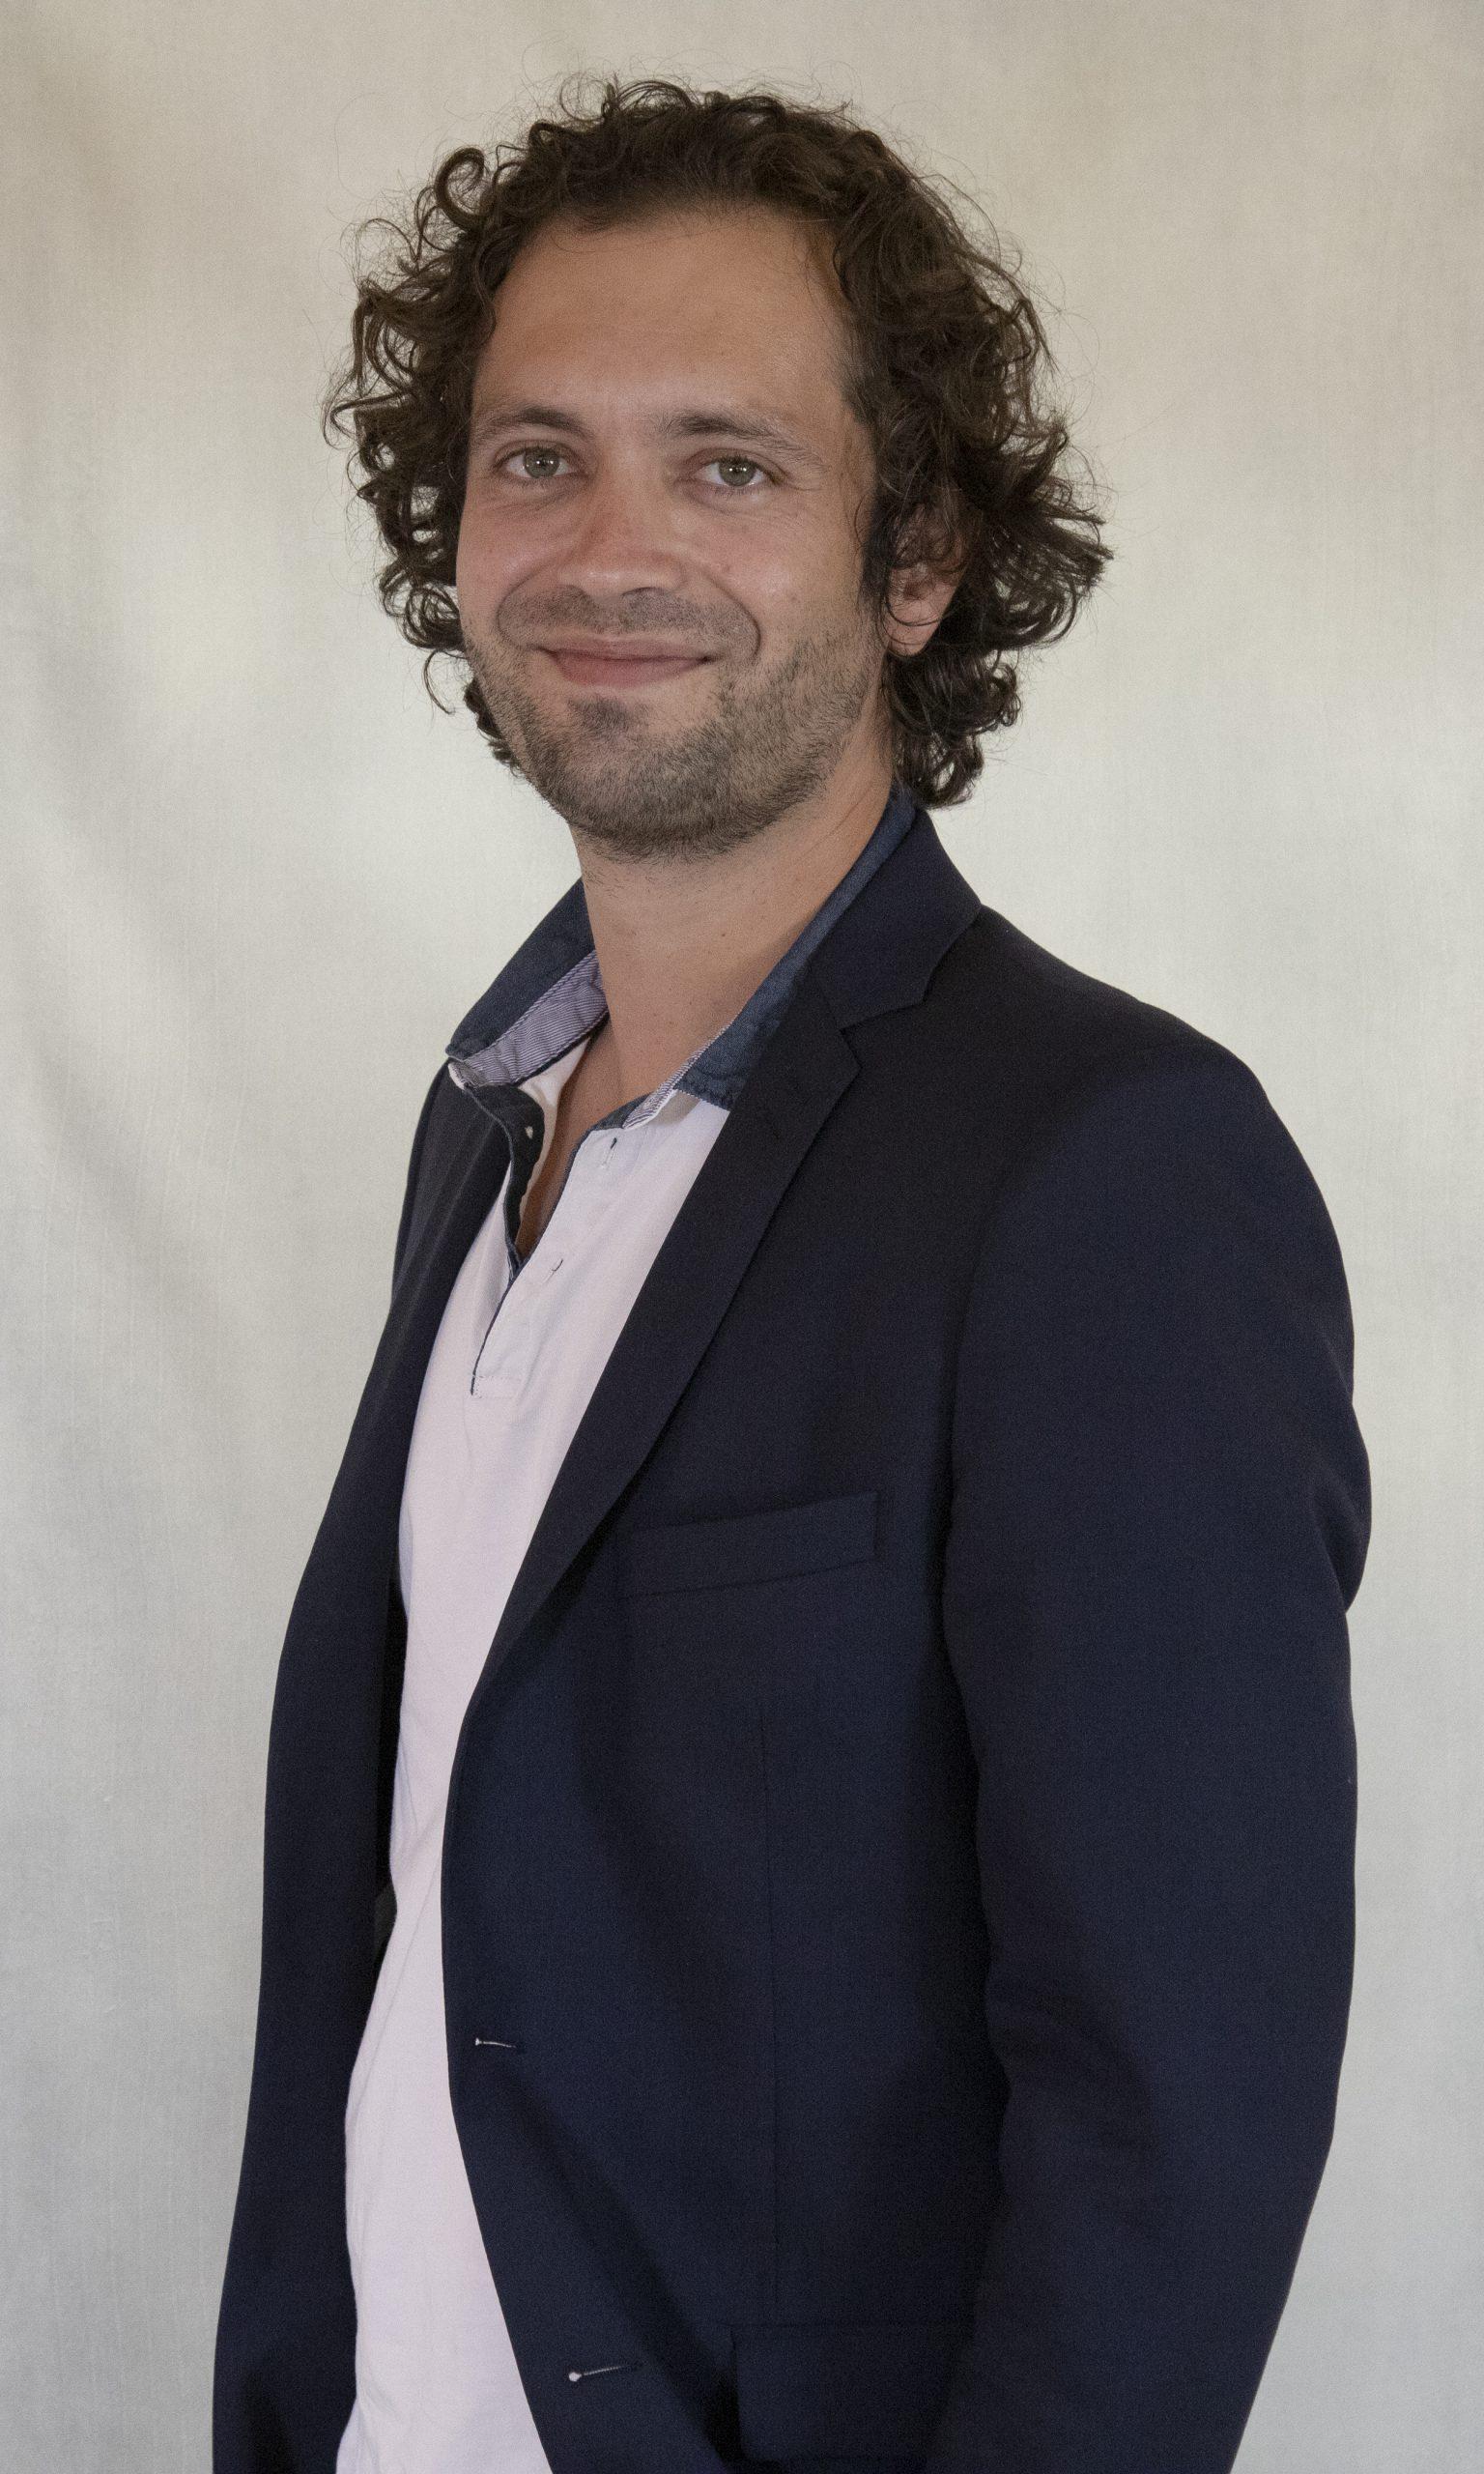 Jean-Julien Lachiche